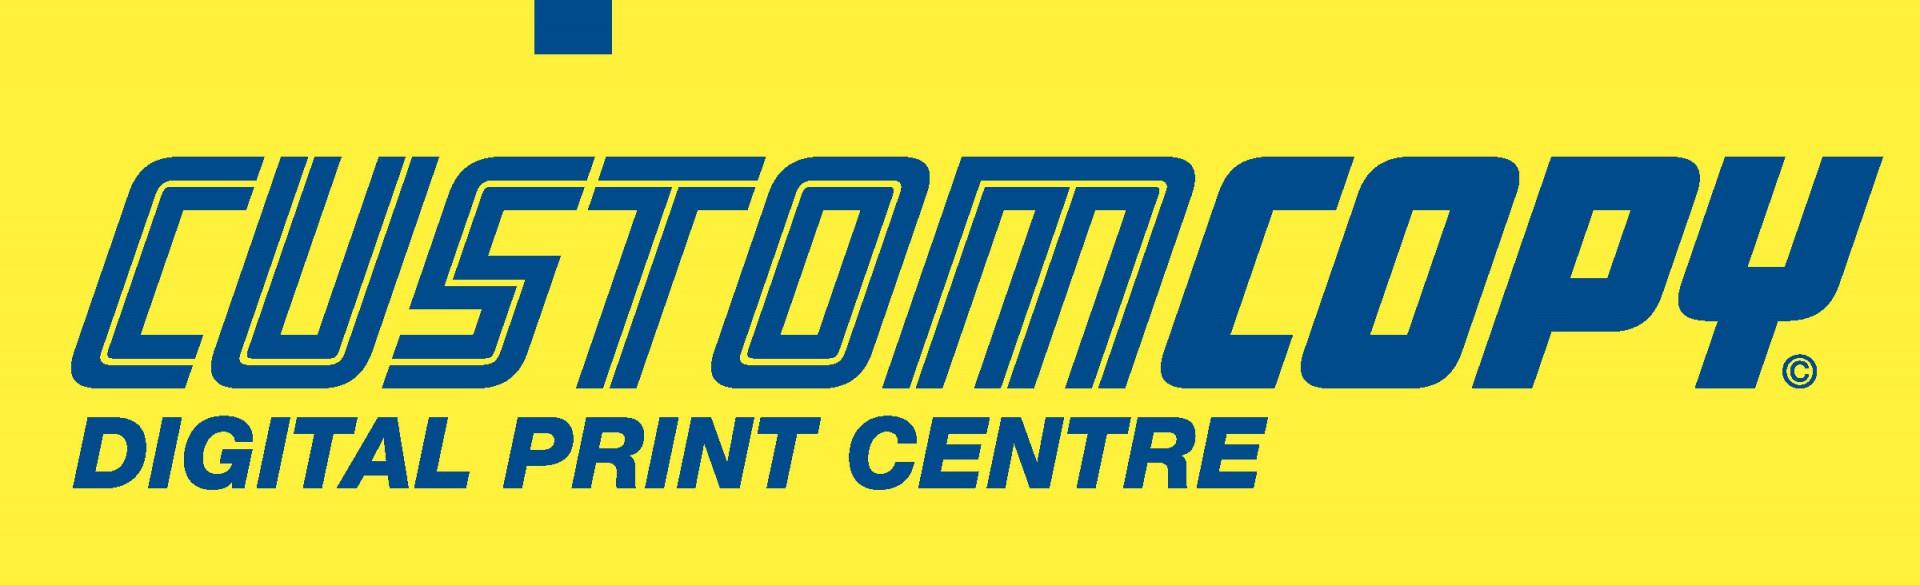 cropped Custom Copy Logo 4 Square